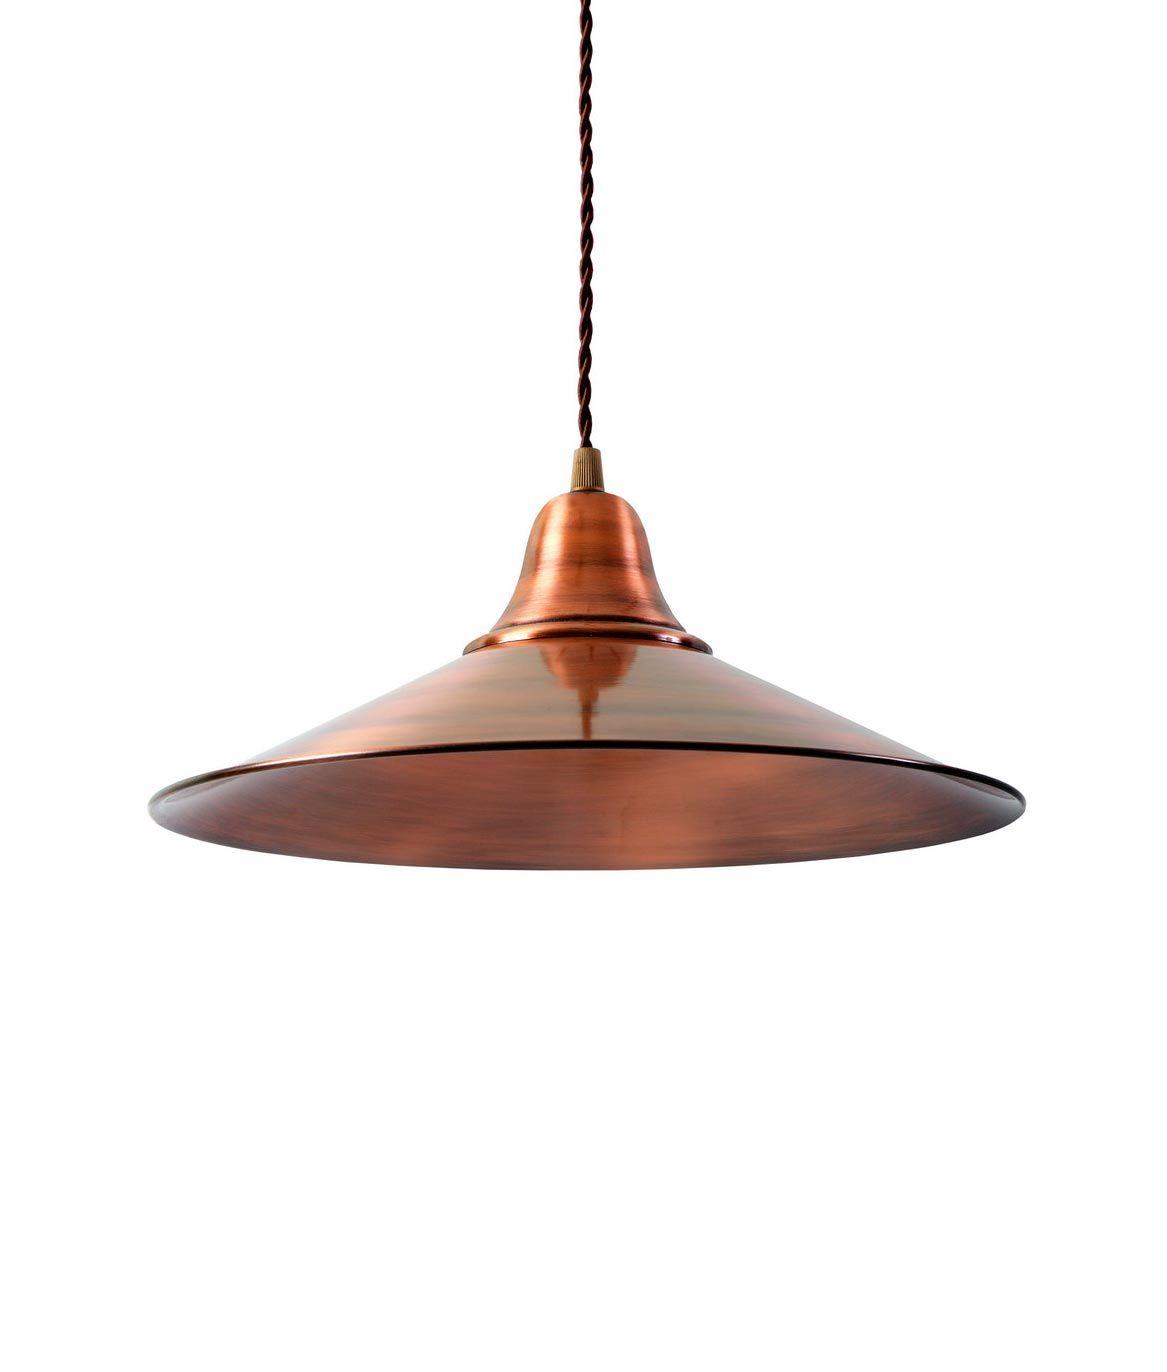 Lámpara retro/vintage cobre KÖLN